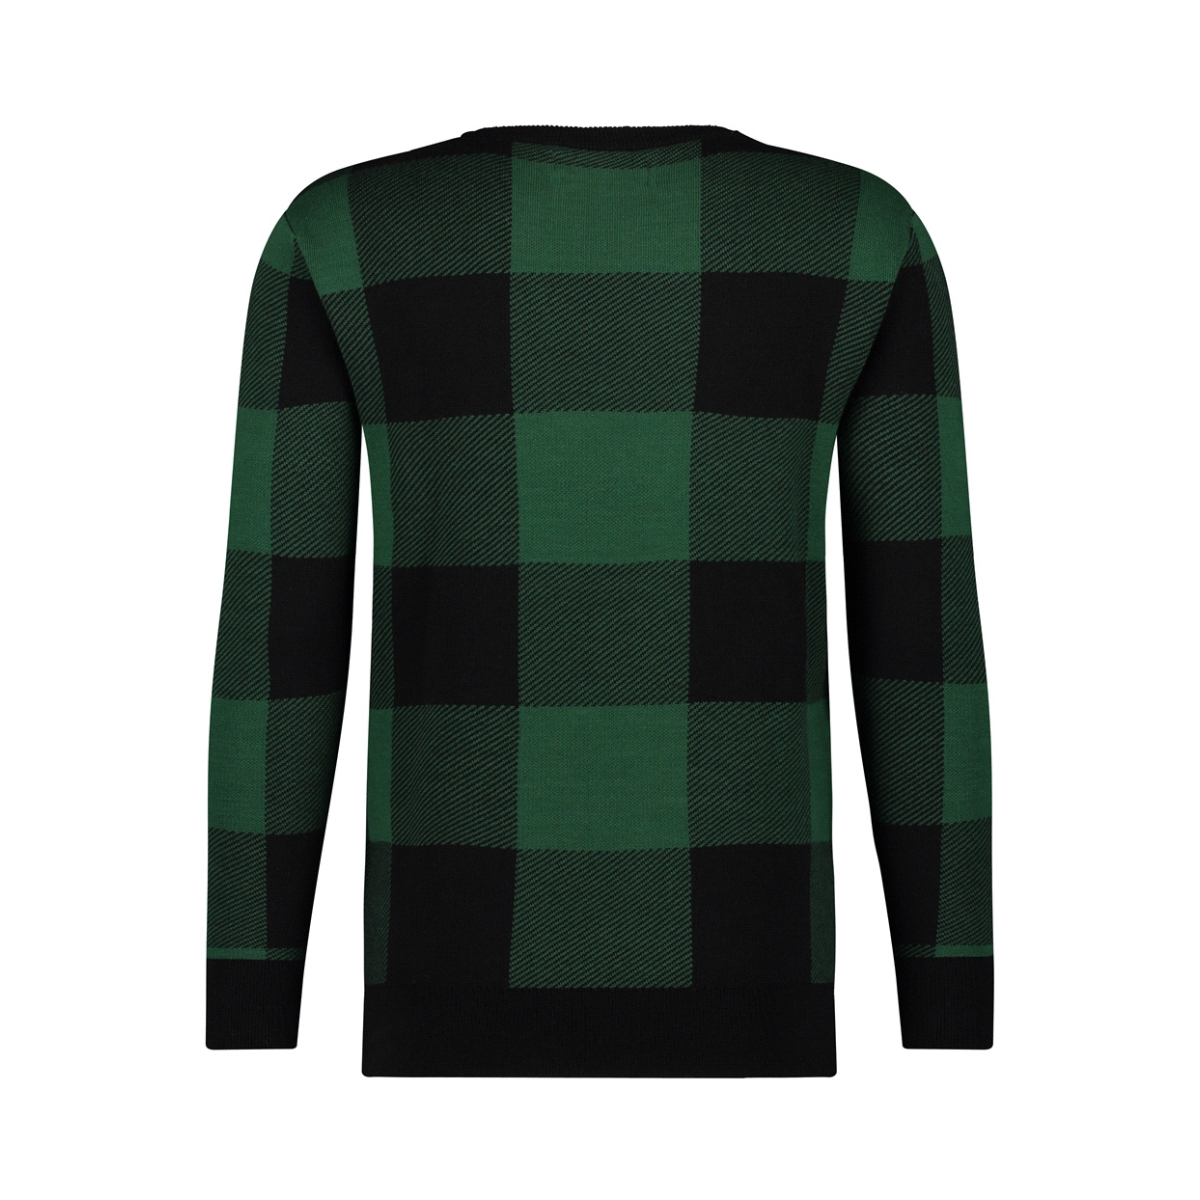 kn lumberjack 1901040800 kultivate trui 428 dark green